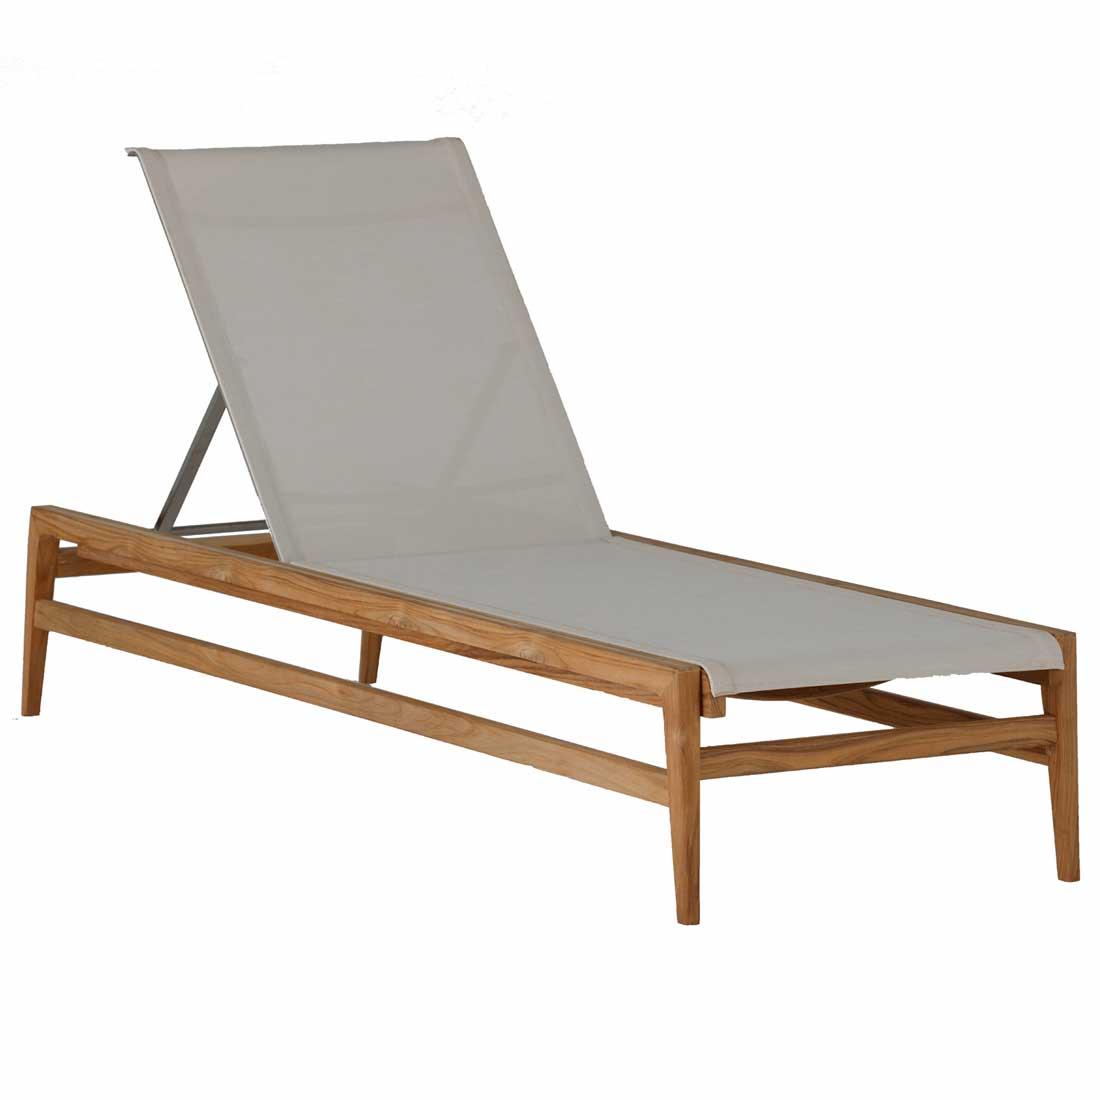 coast teak chaise lounge - Dimensions: W27 D79.75 H37.5